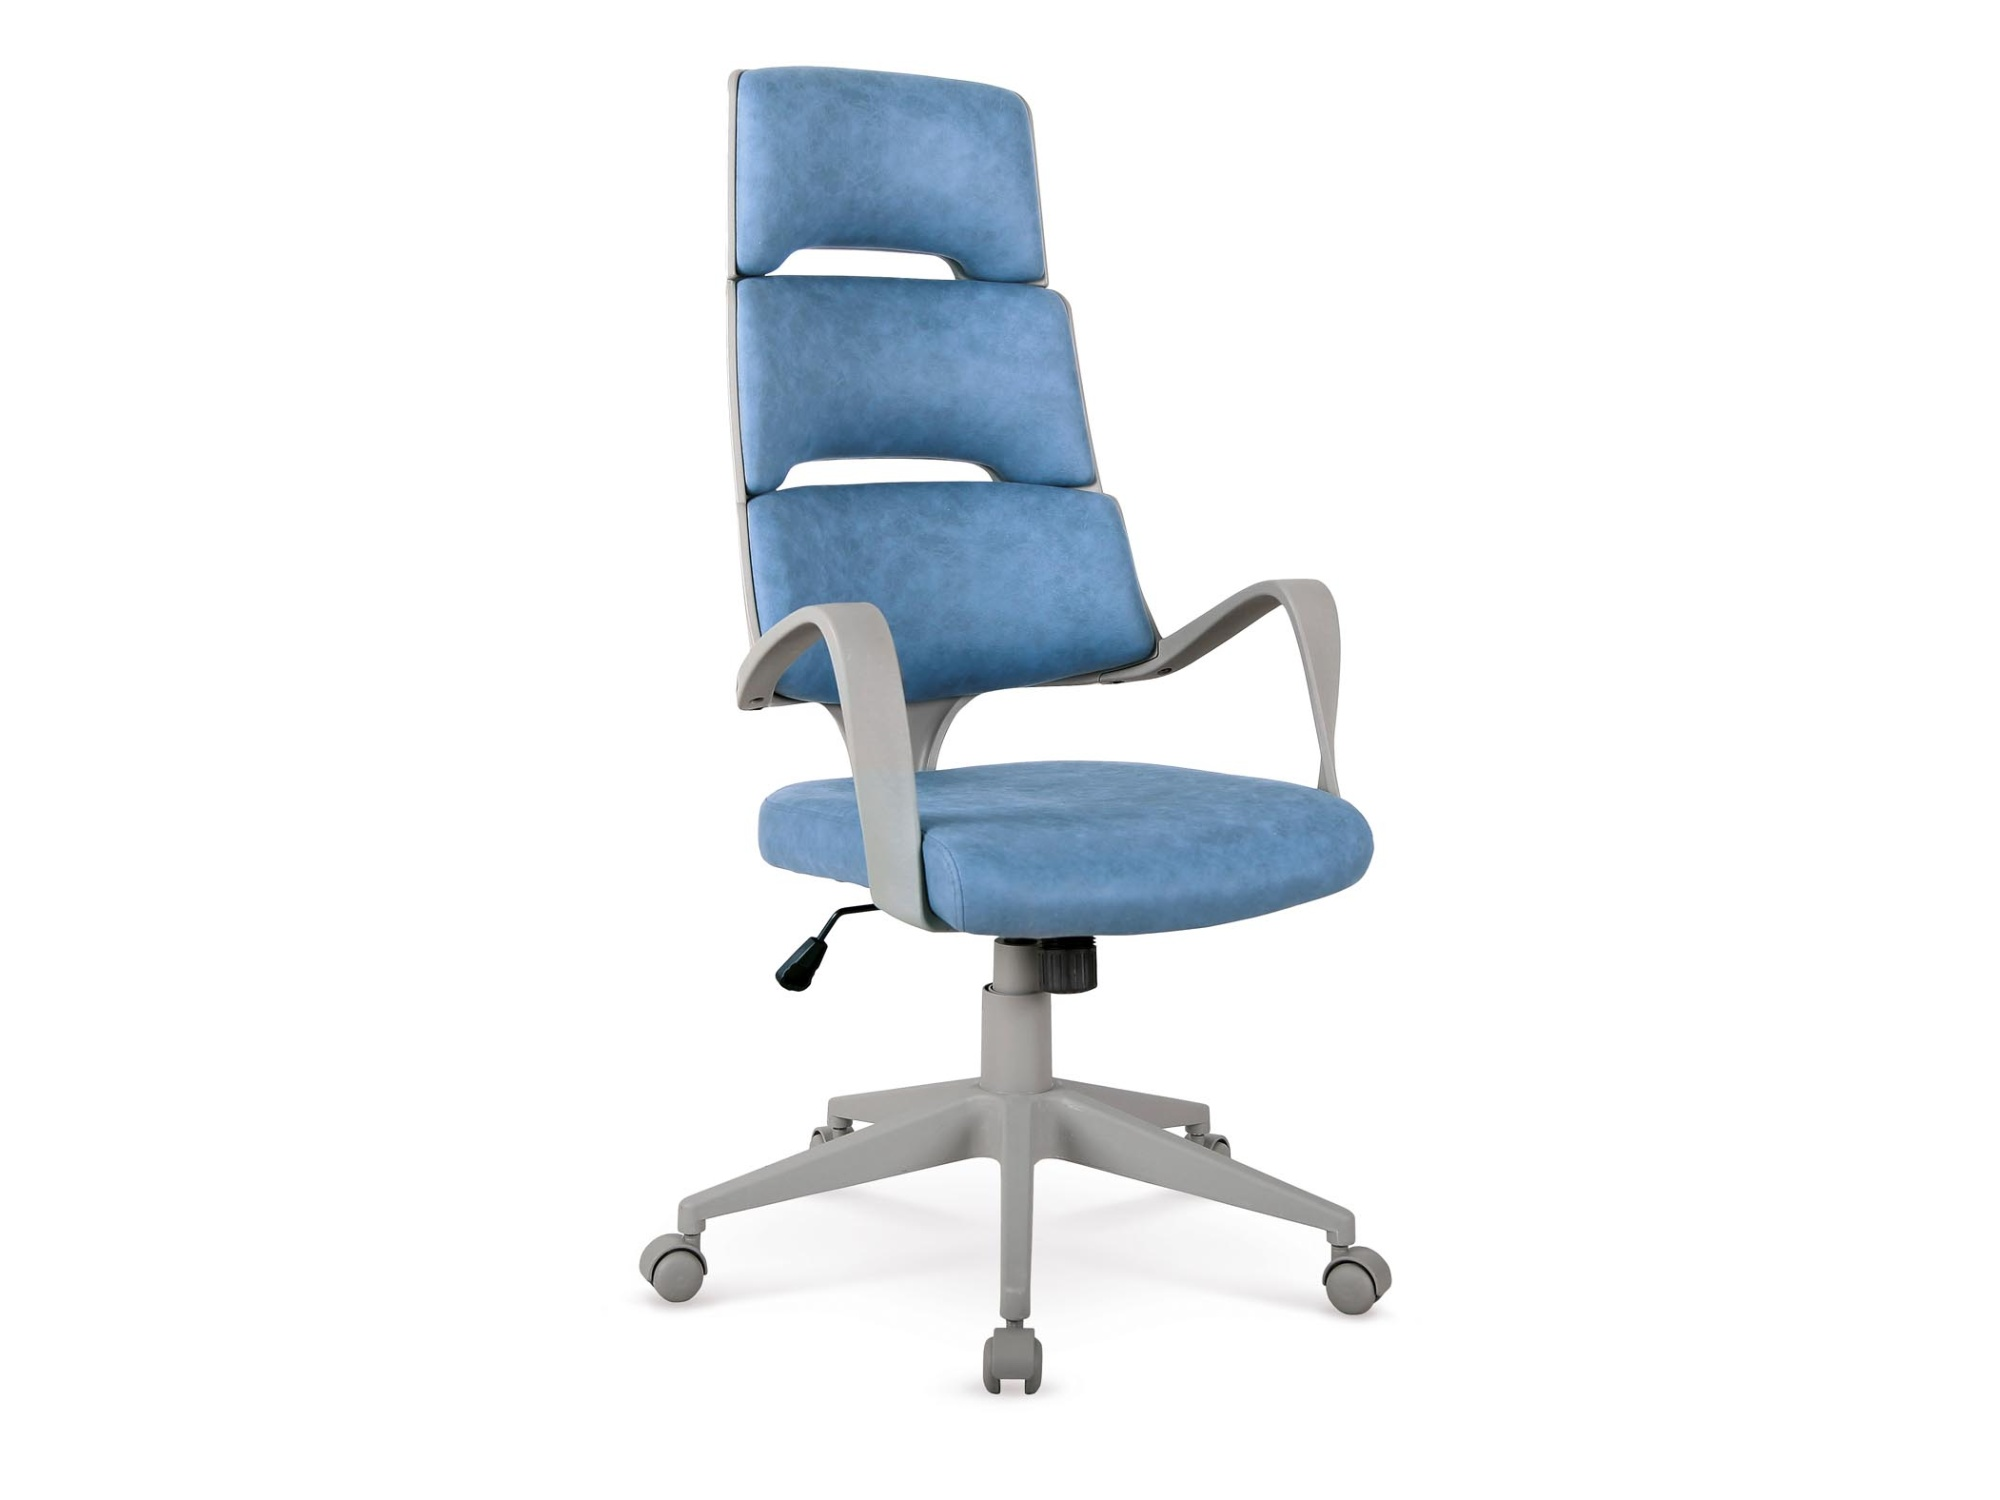 Kancelářská židle CALYPSO, modro-šedá